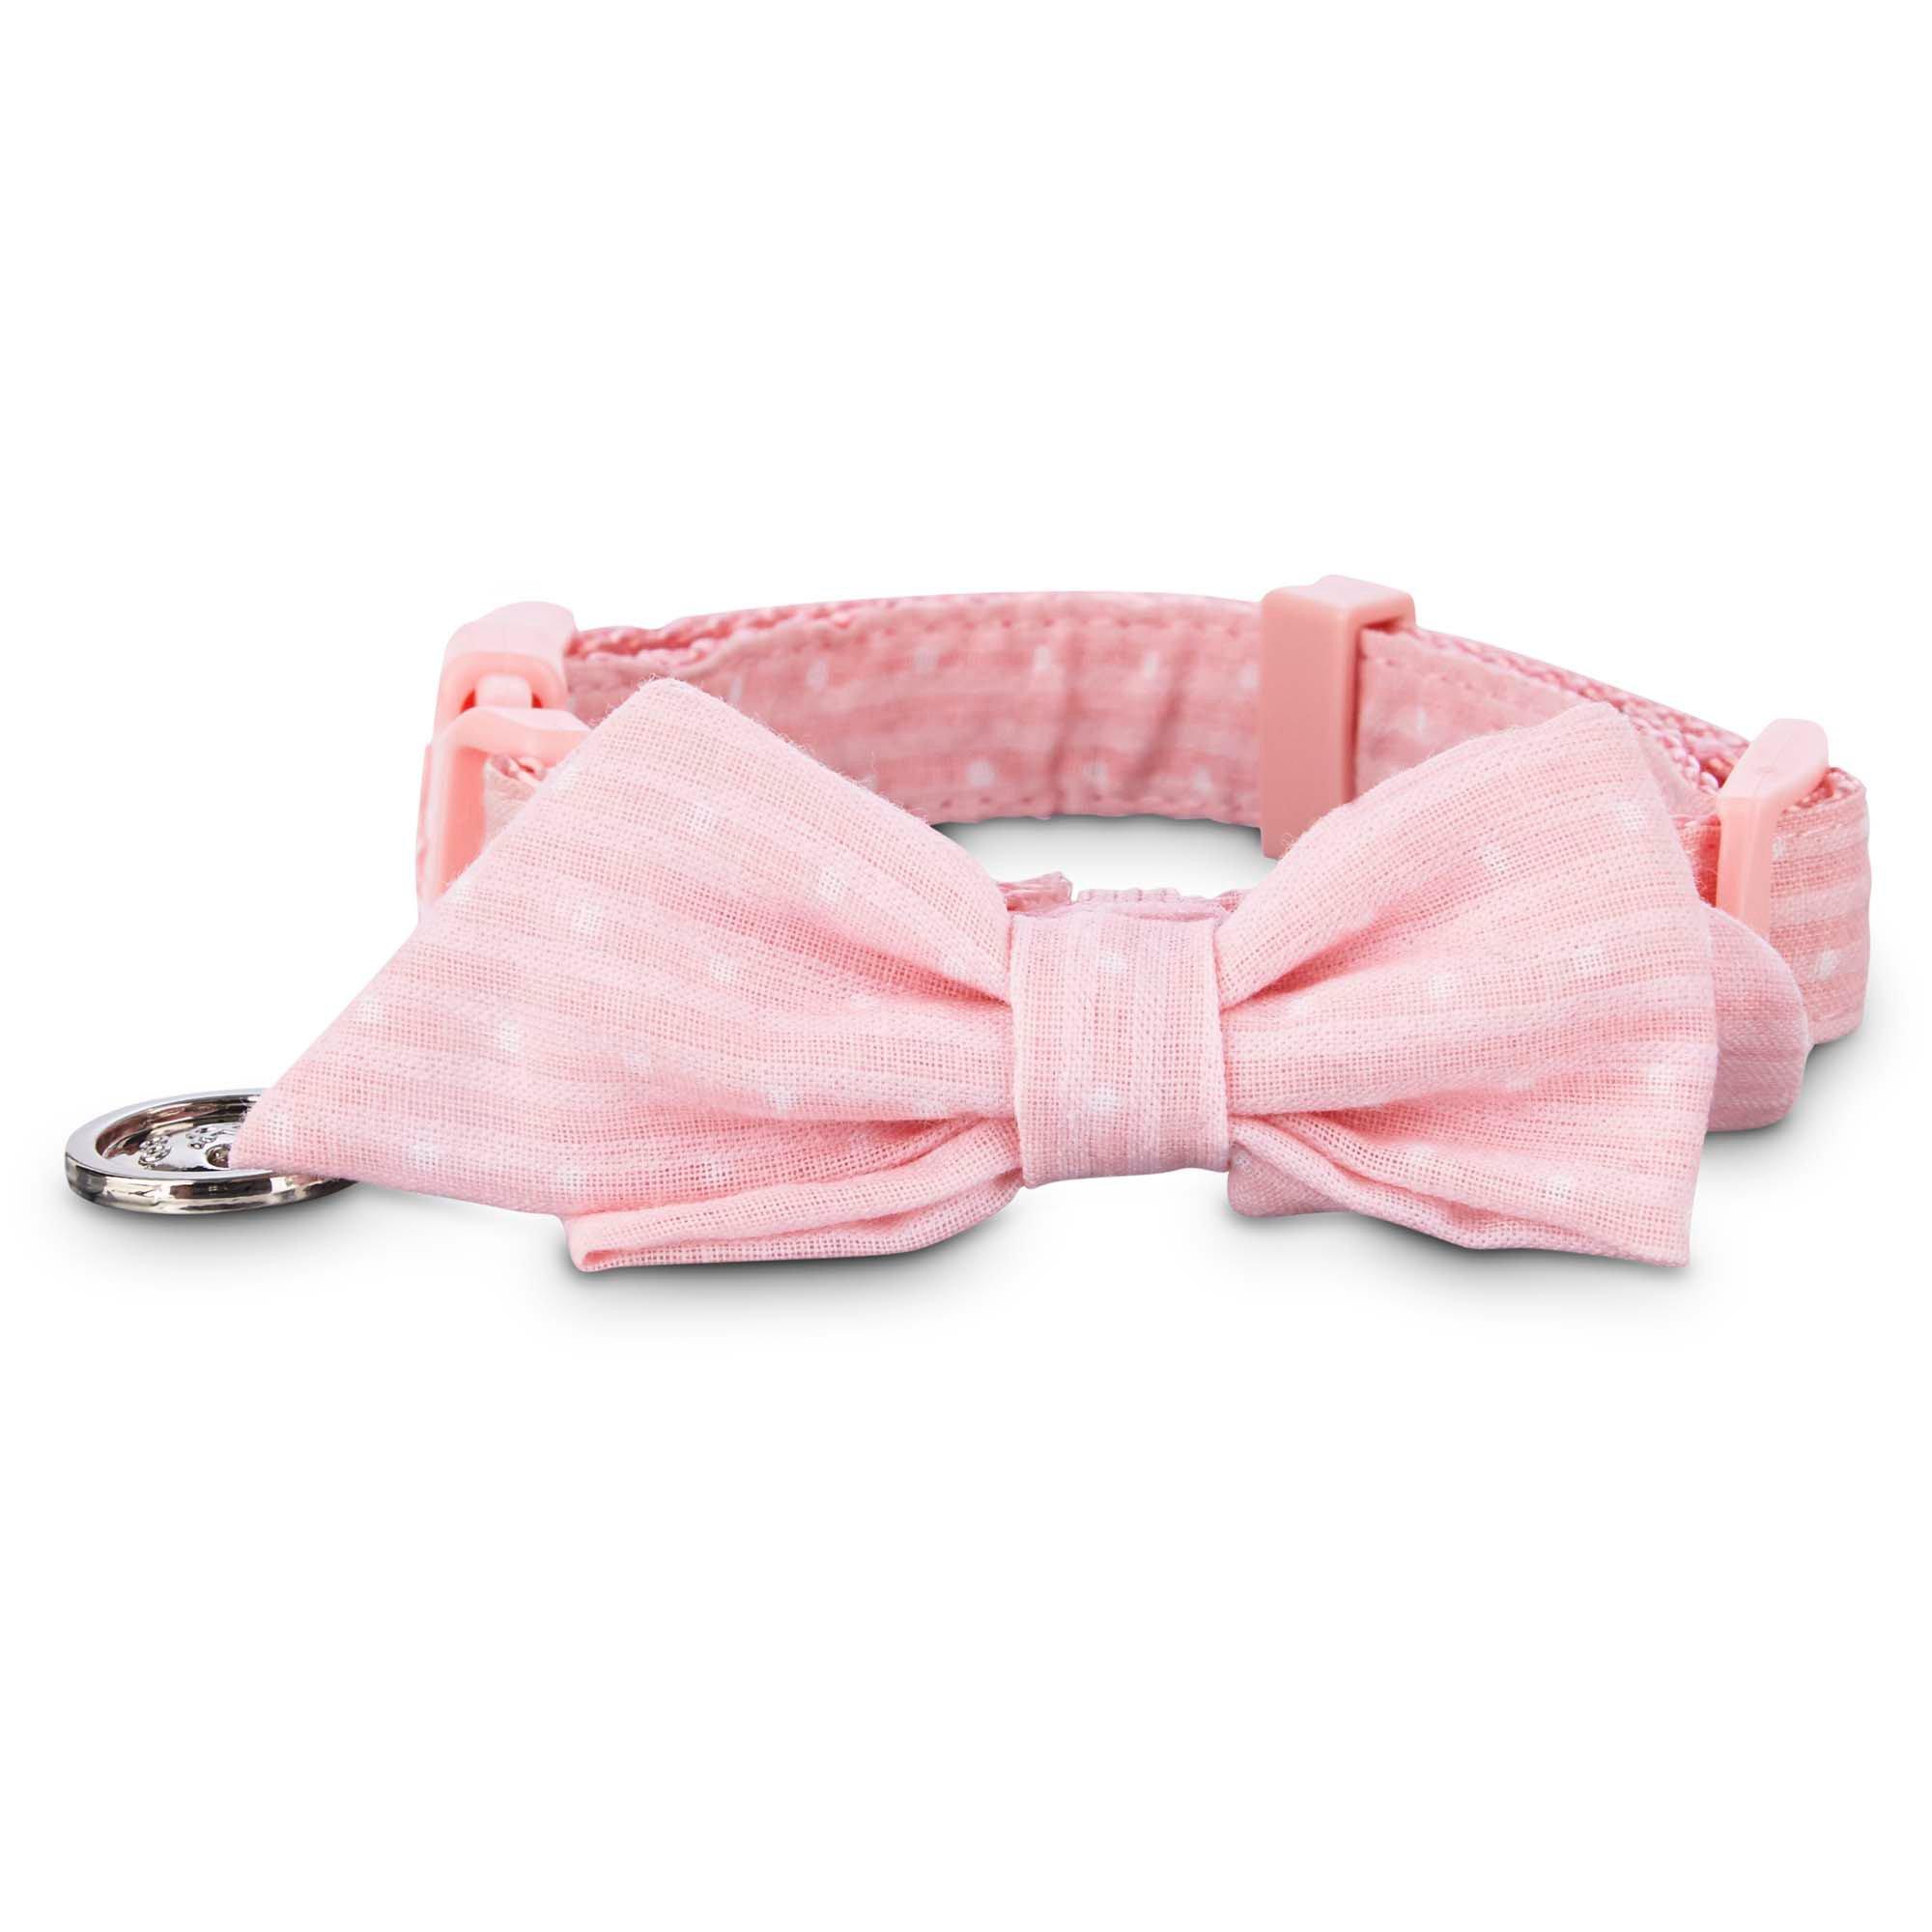 Bond & Co. Pink Polka Dot Puppy Collar | Petco at Petco in Braselton, GA | Tuggl